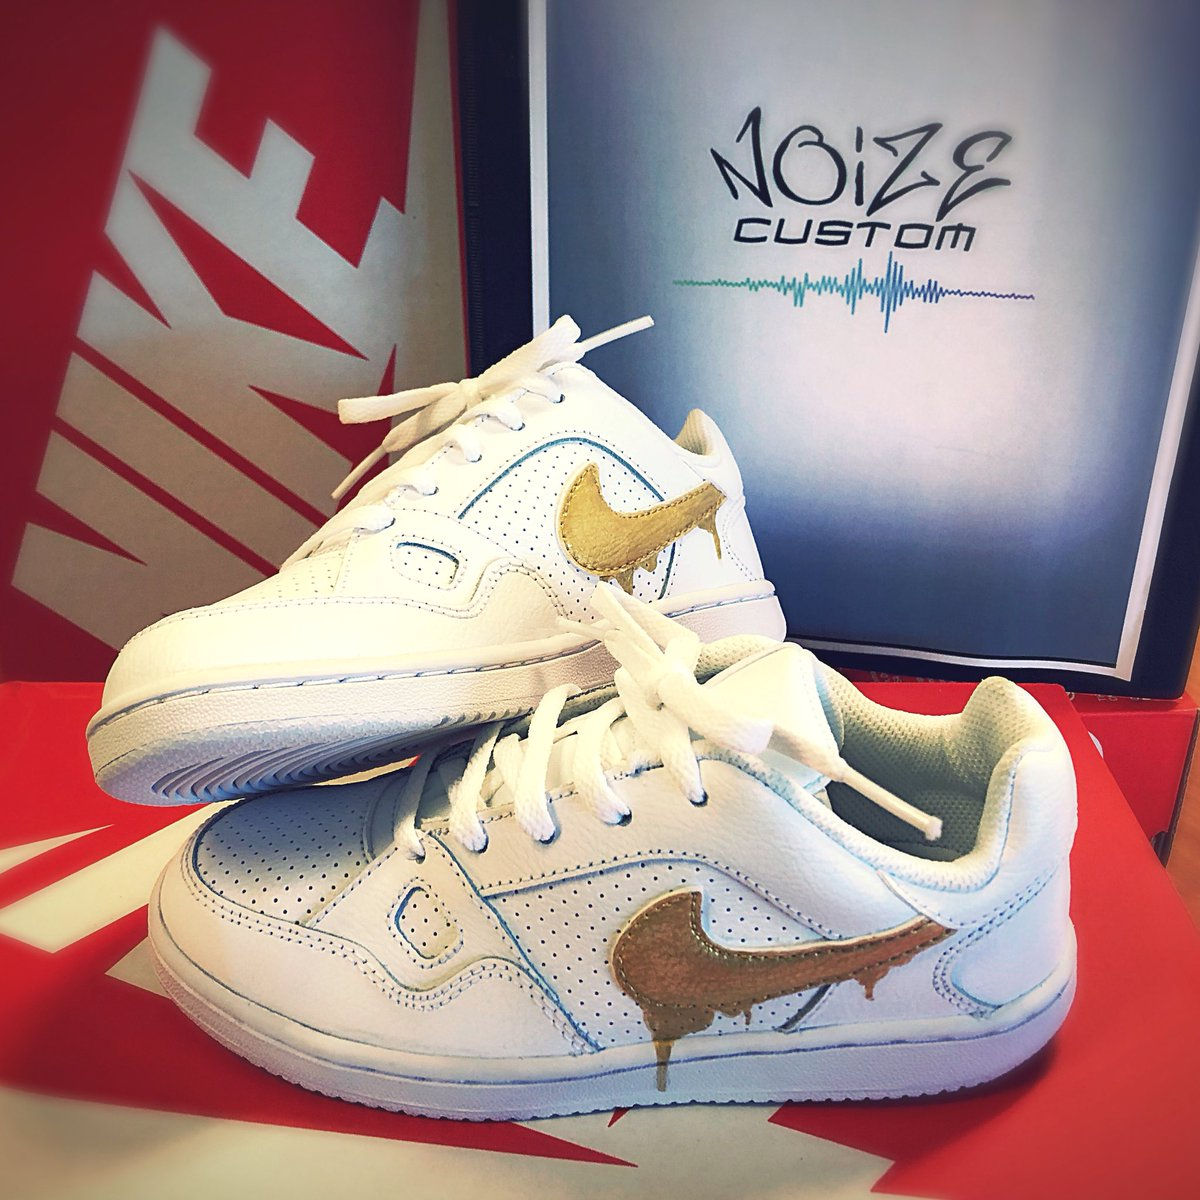 406413714373 Noize Custom on Twitter